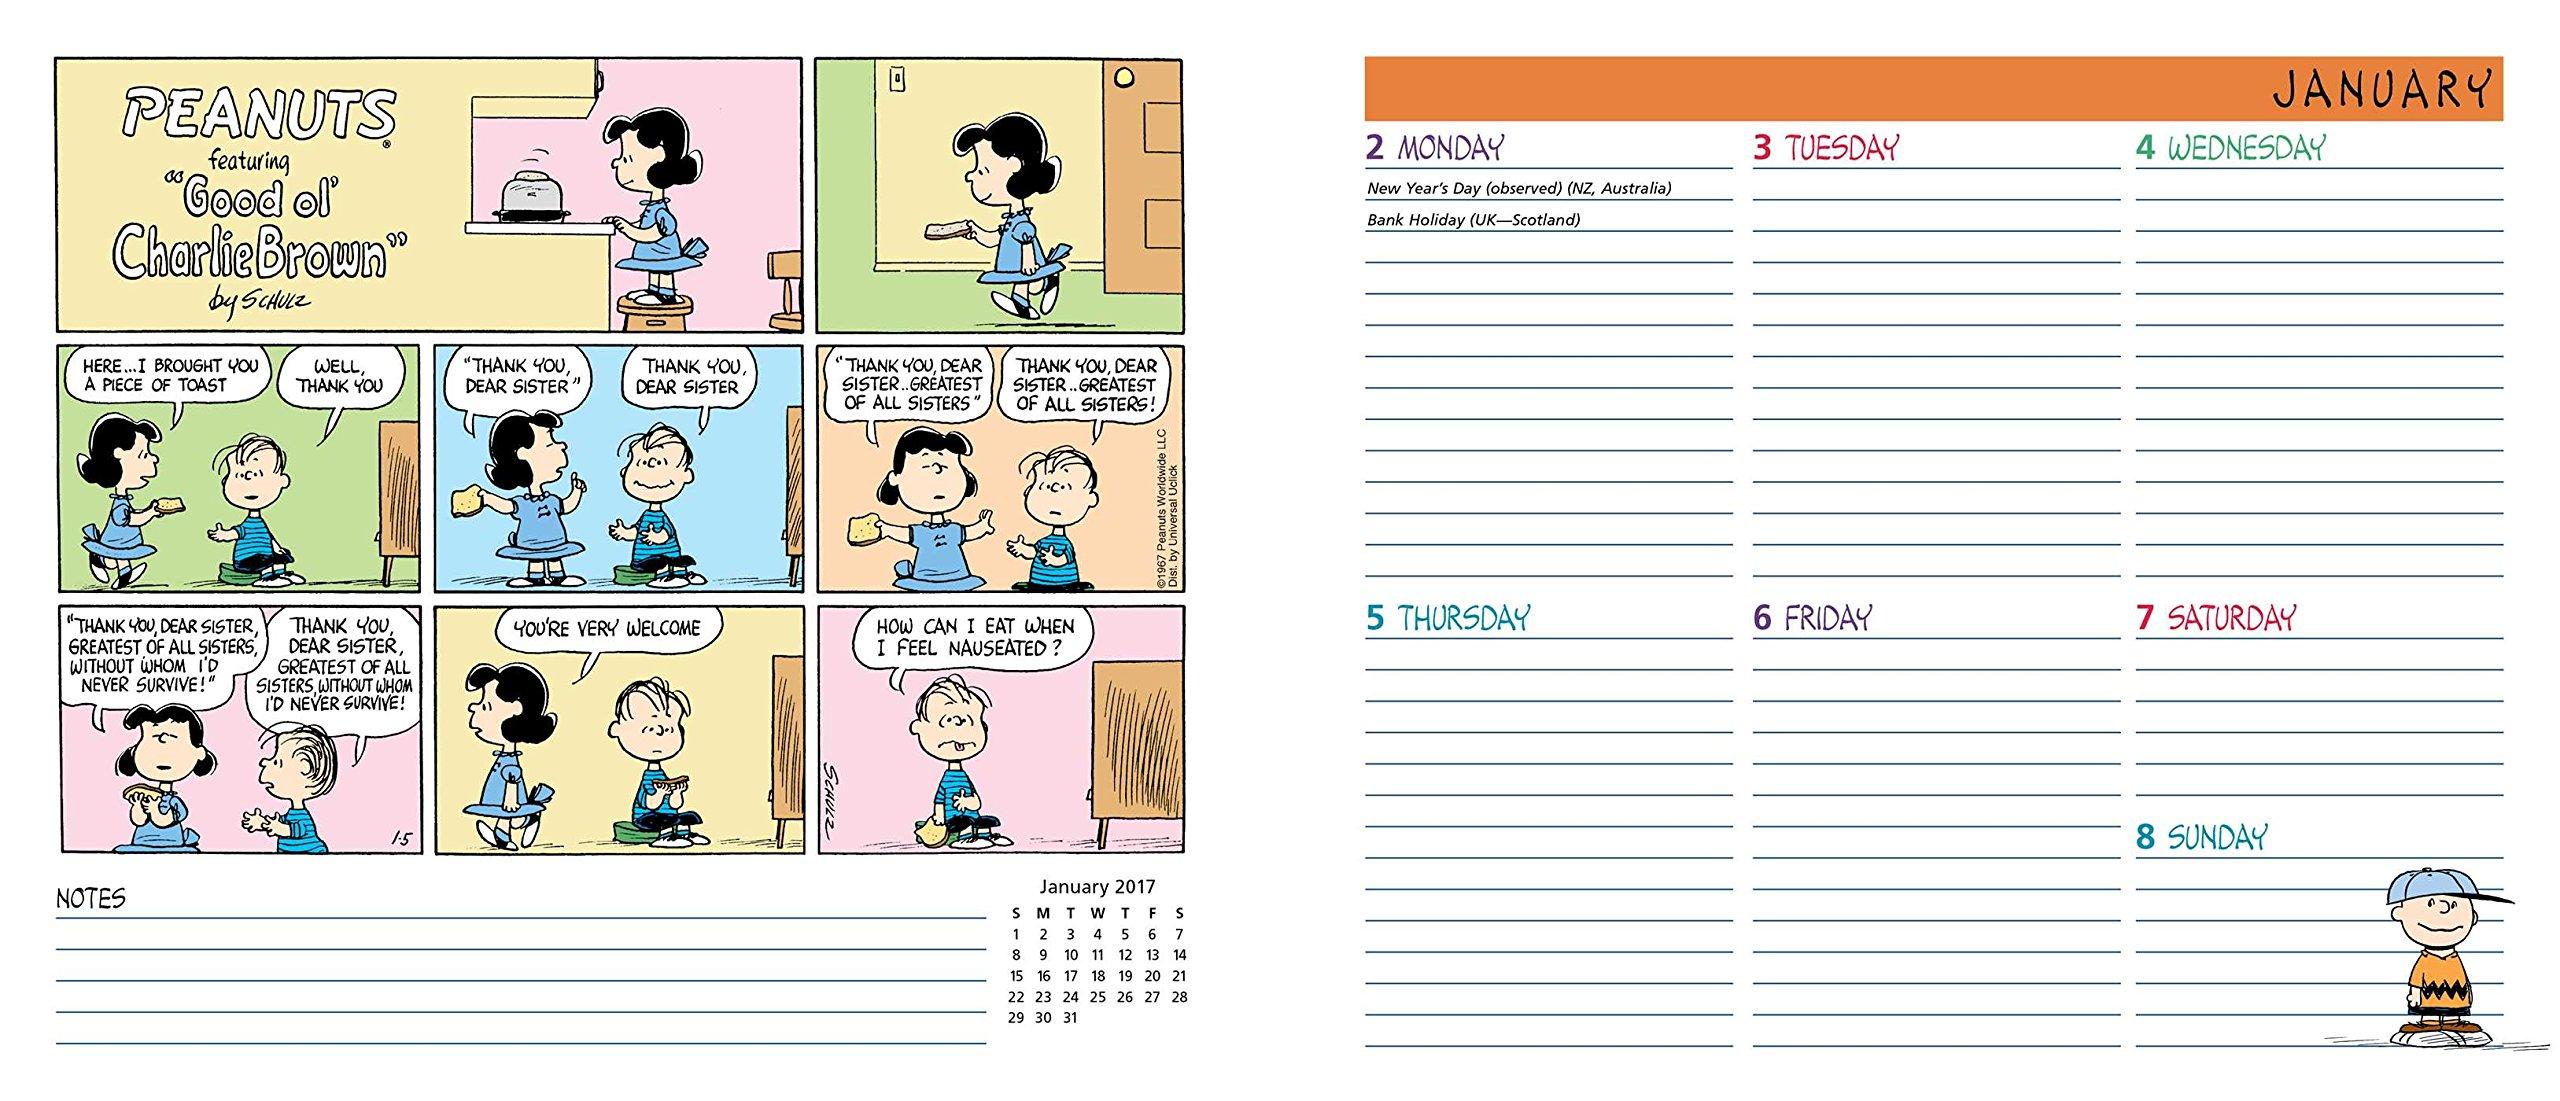 peanuts 2017 weekly planner calendar peanuts worldwide llc